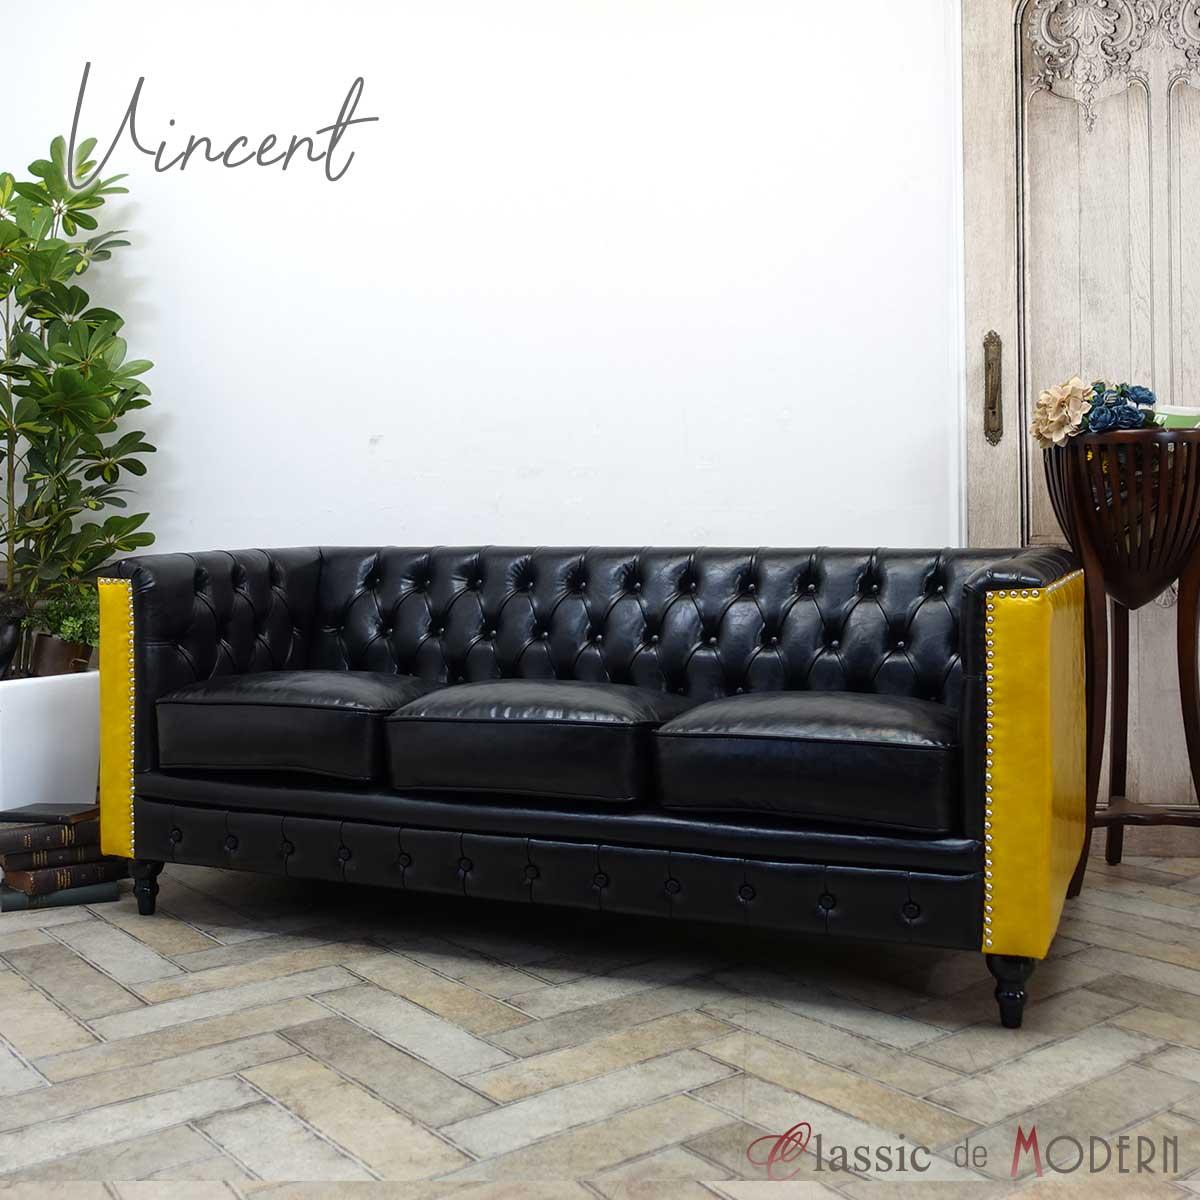 Vincent triple sofa generic fake leather PU yellow black fake leather black  yellow vm3p51p69k